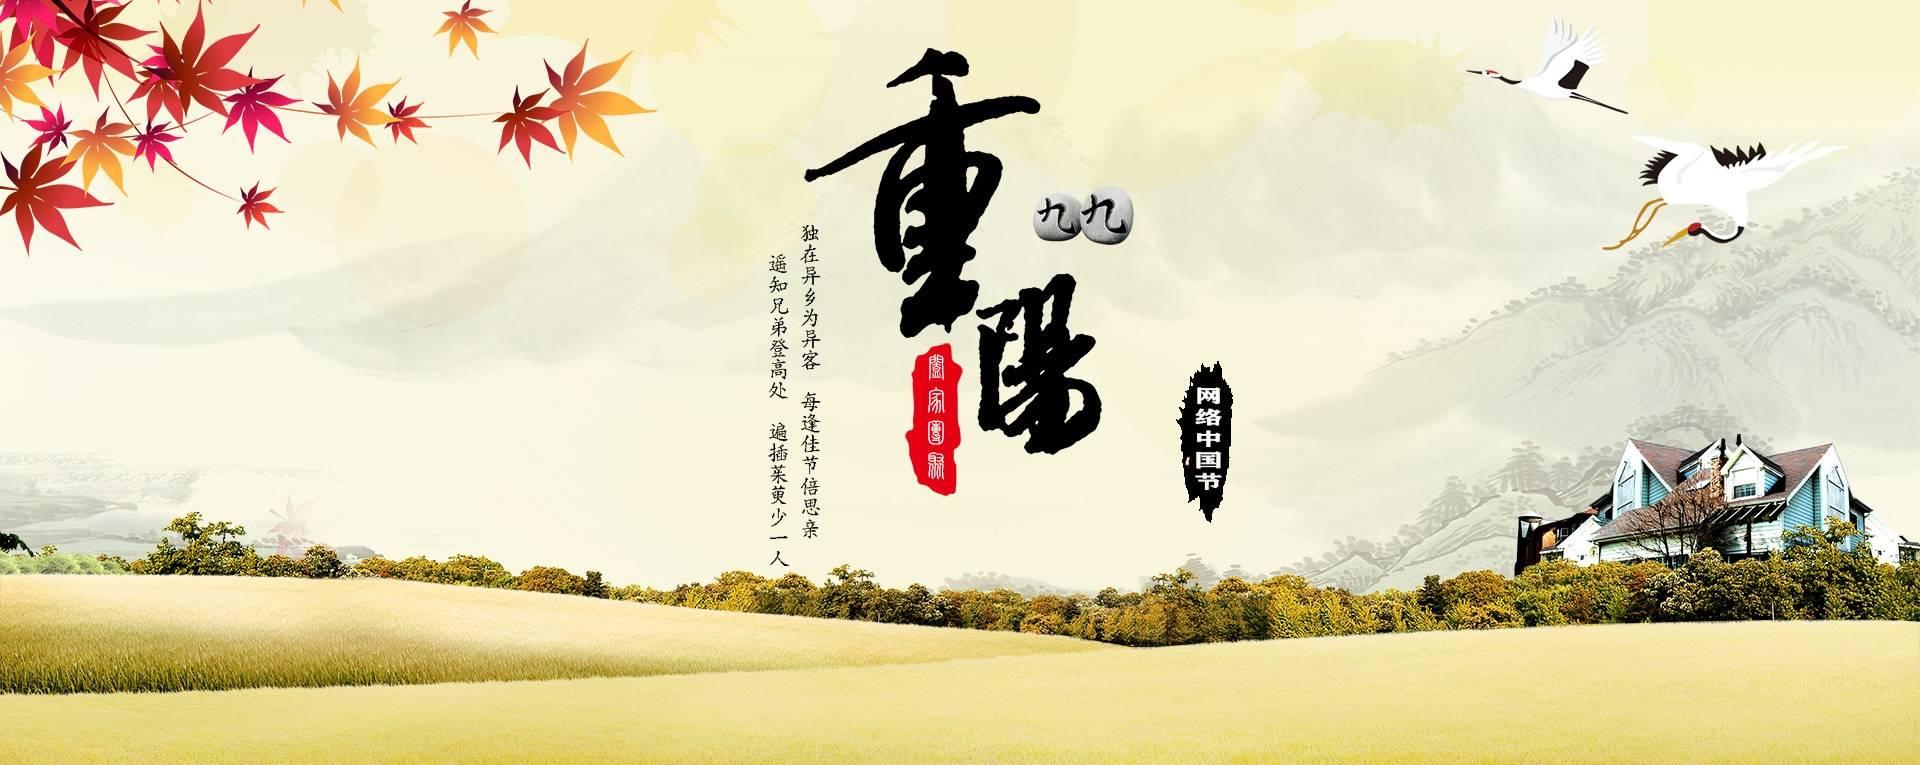 news-Chung Yeung Festival-WINPAI-img